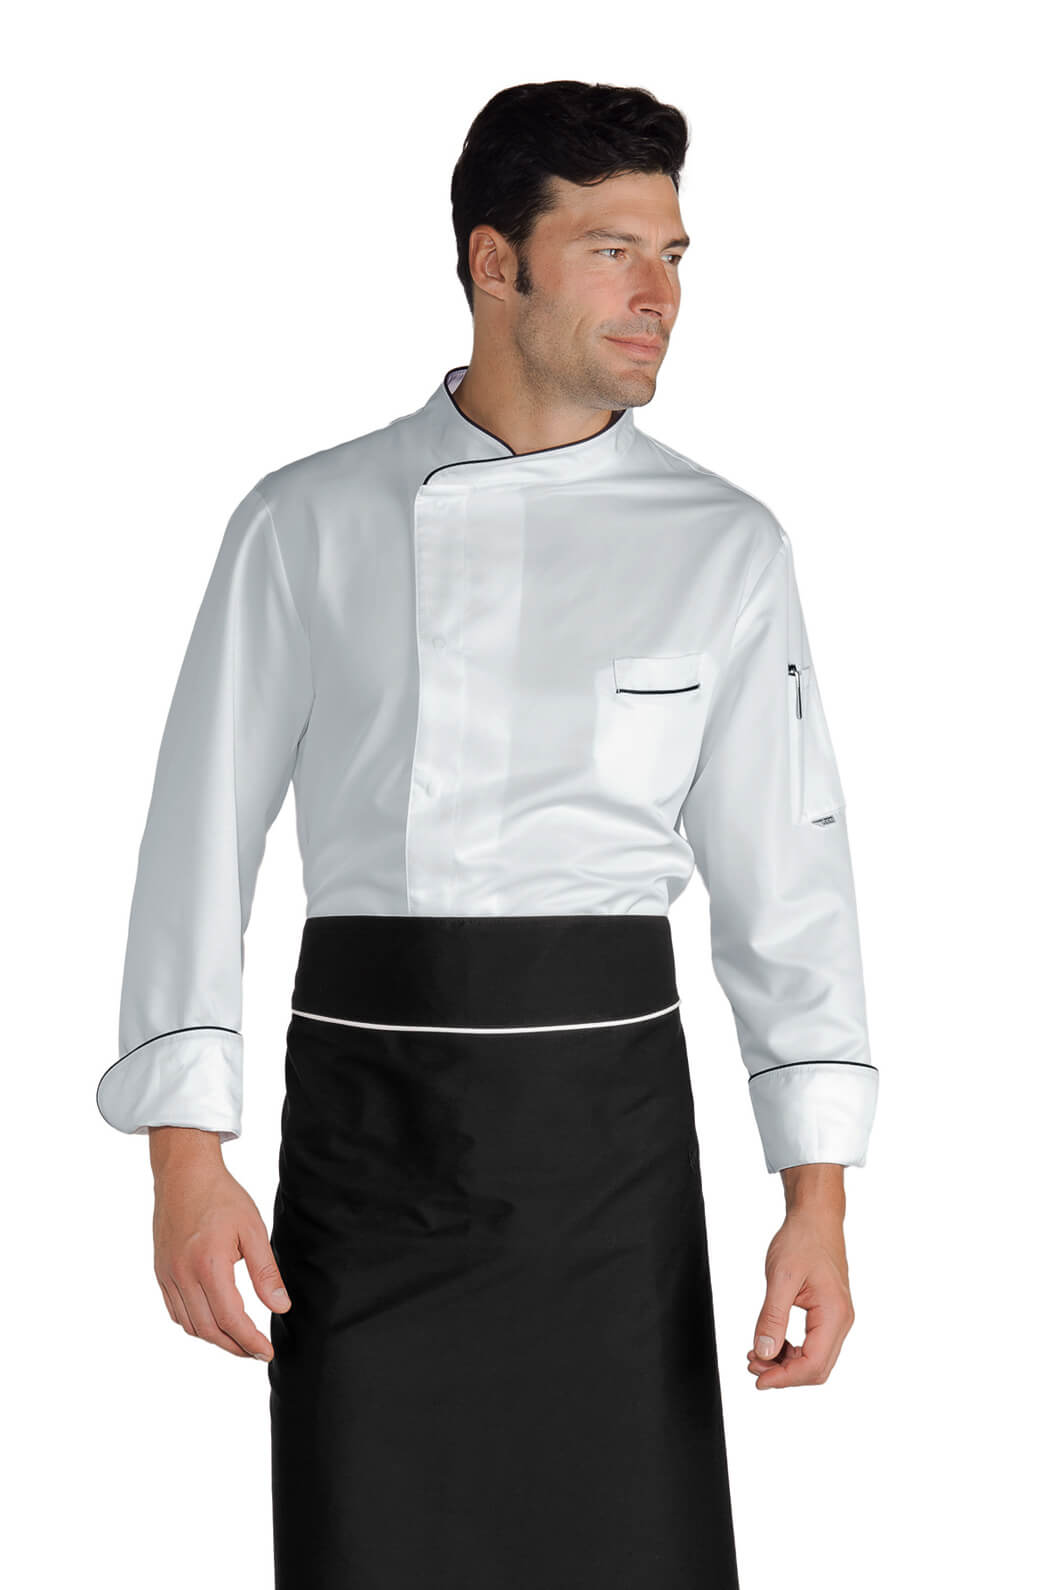 Veste chef cuisinier bilbao blanc noir microfibres for Cuisinier particulier